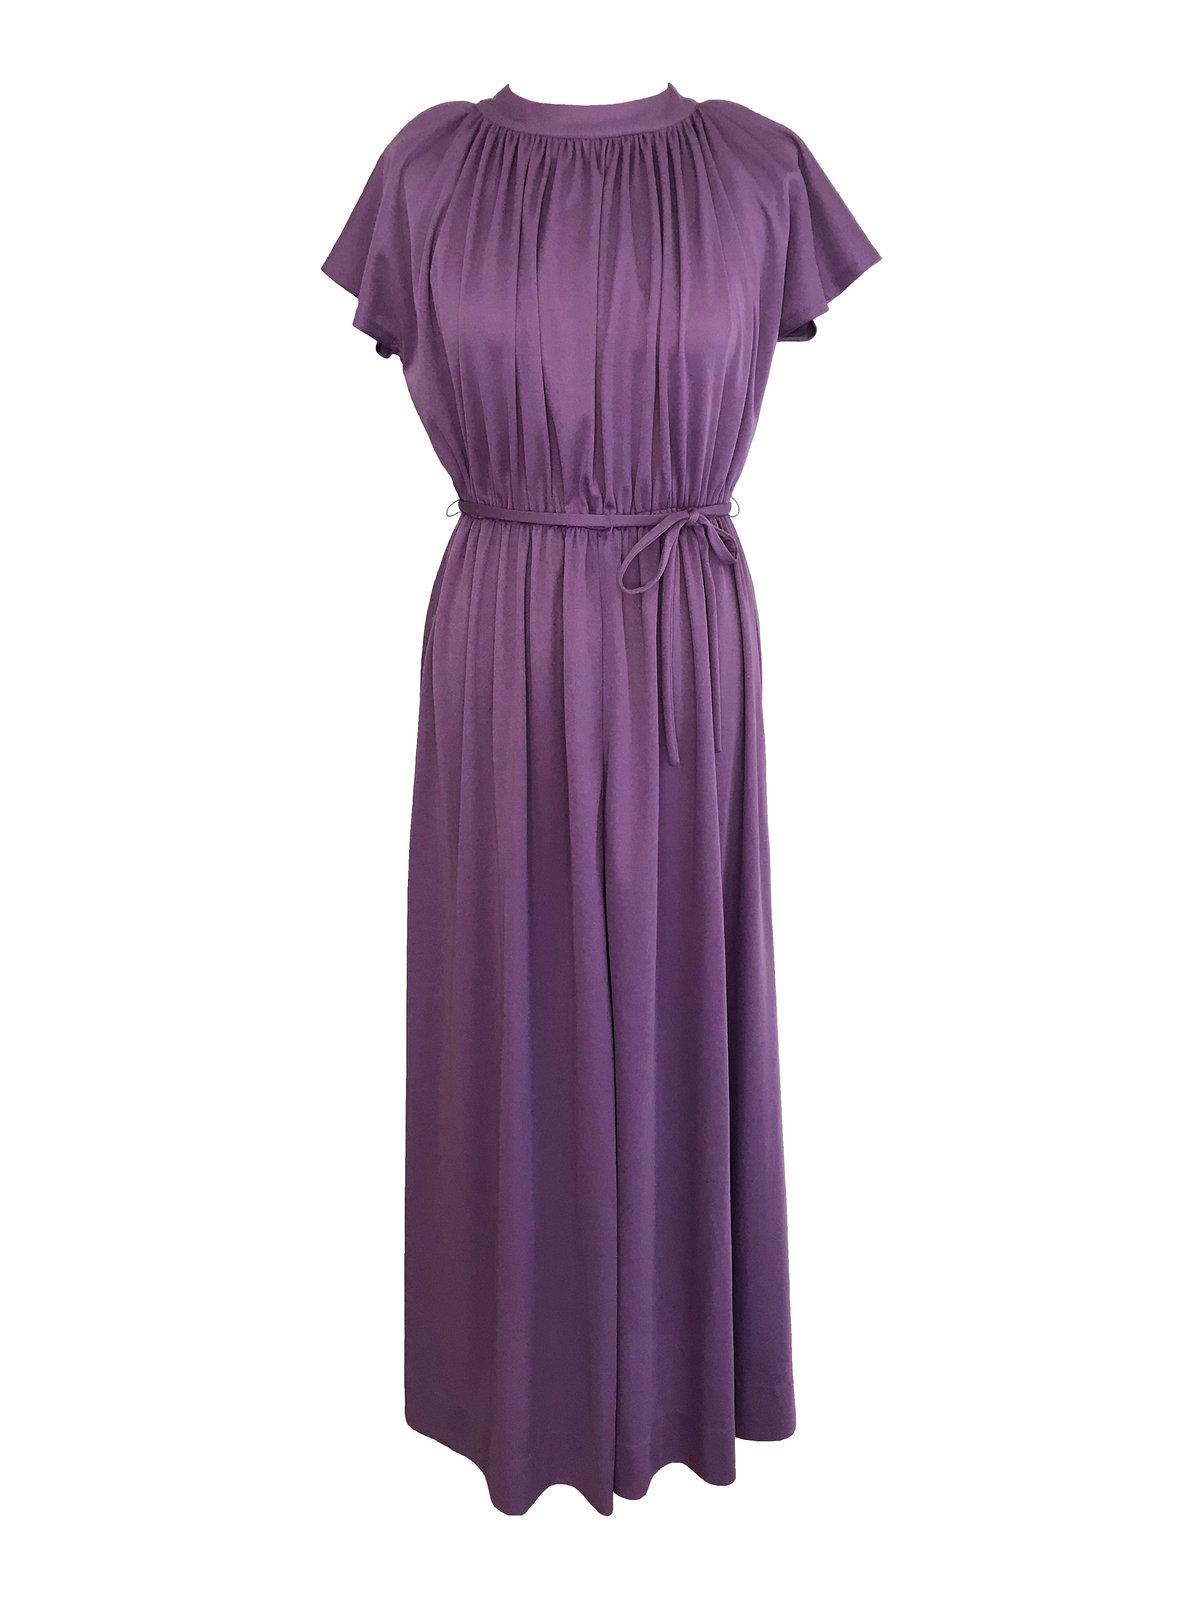 70s Lavender Plum Heather Grecian Style Ruched Draped Tunic Raglan Kimono Sleeve image 2